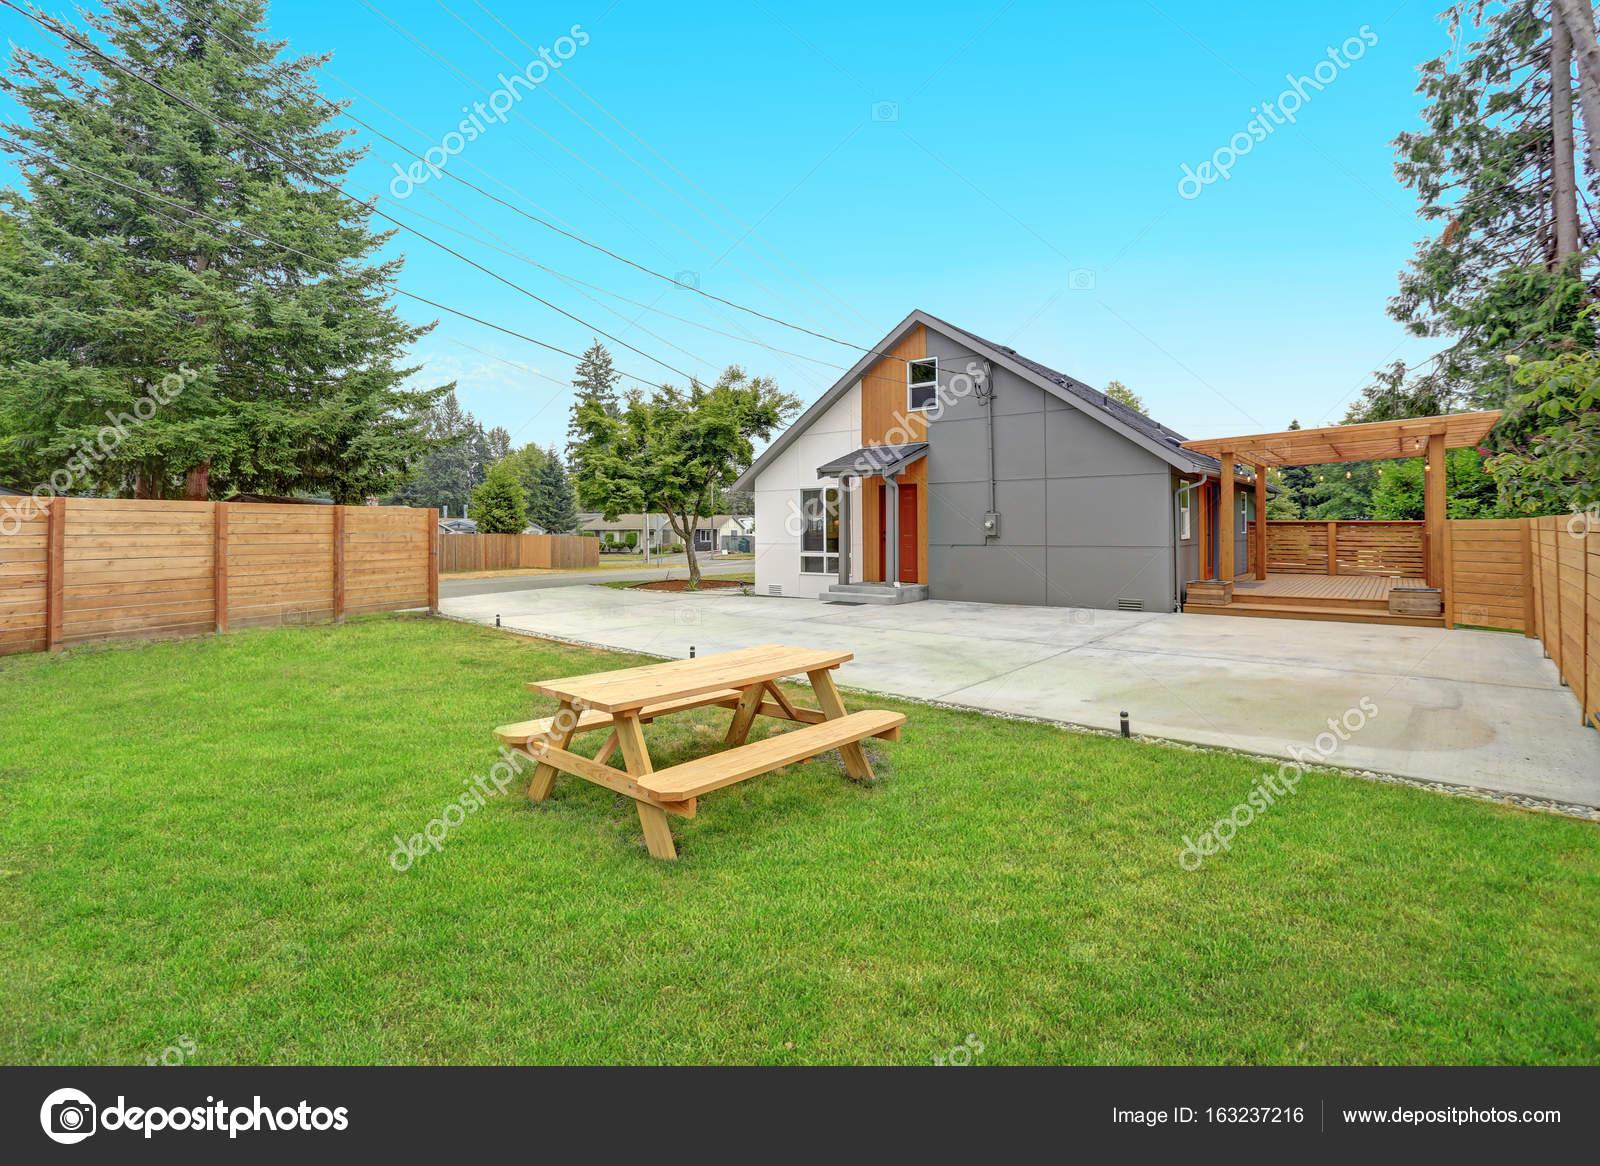 Geheel gerenoveerd modern huis in everett u2014 stockfoto © alabn #163237216